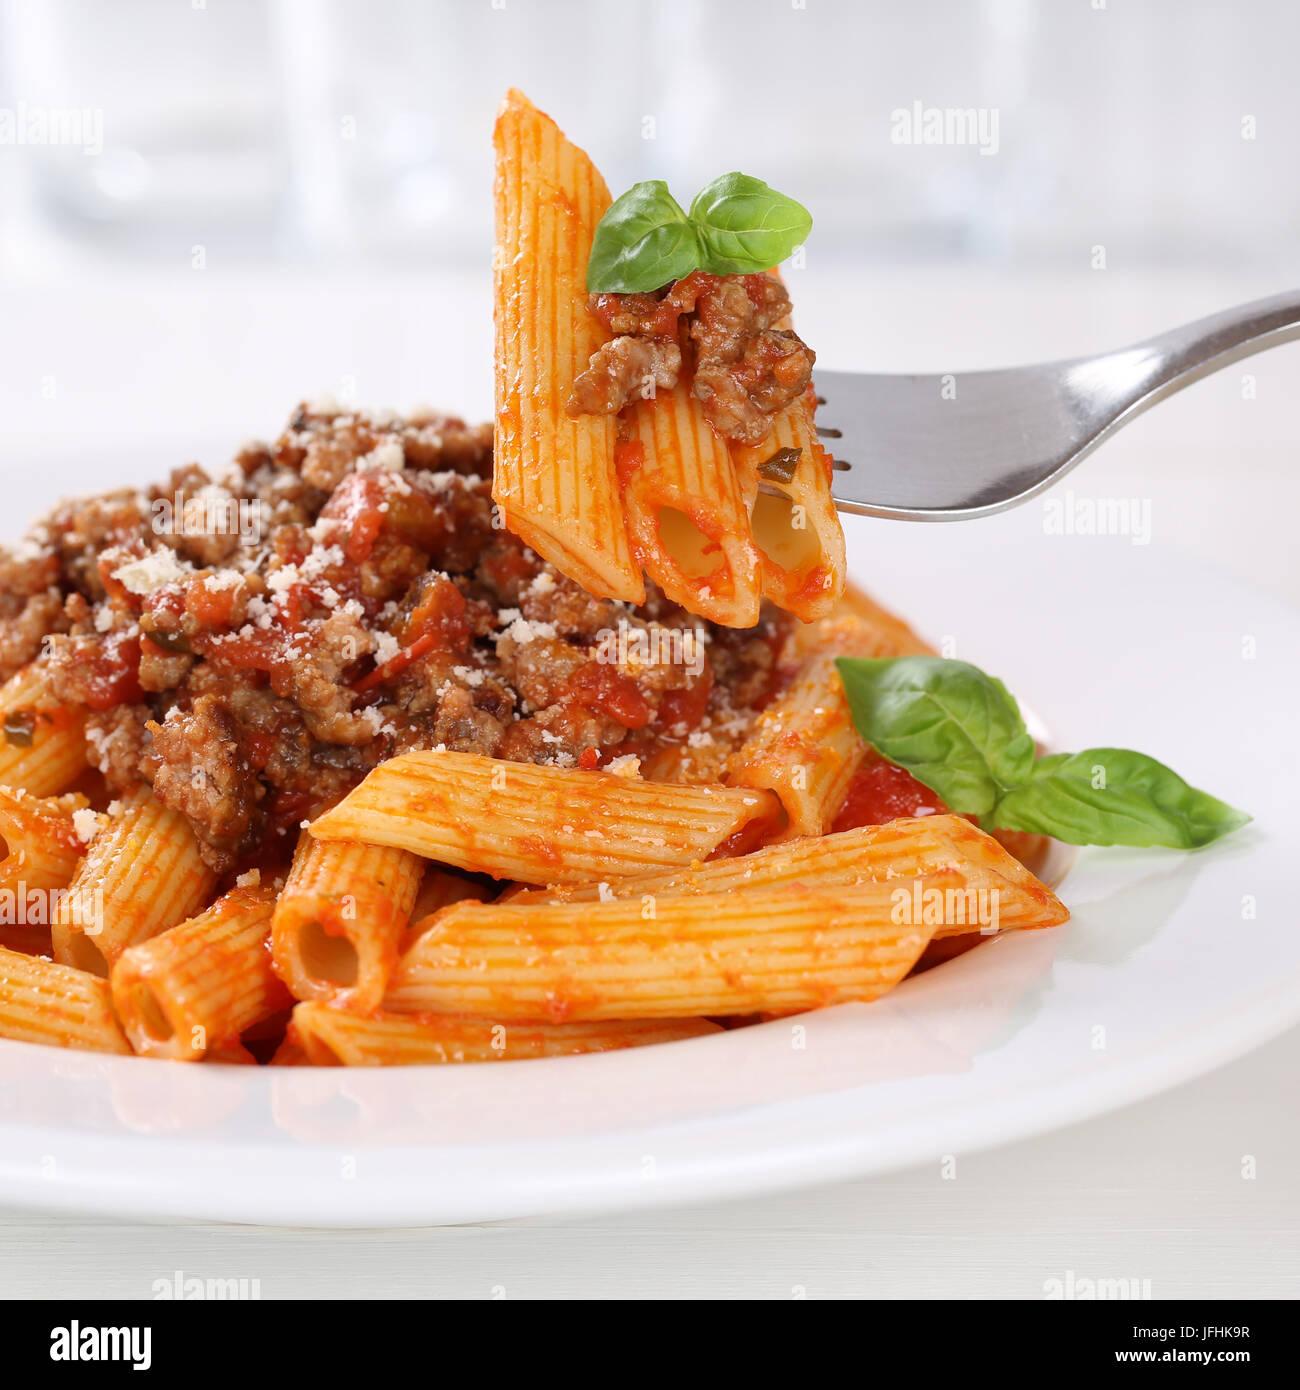 Italienisch Essen Penne Rigate Sauce Bolognese Nudeln Pasta Gericht Stockbild